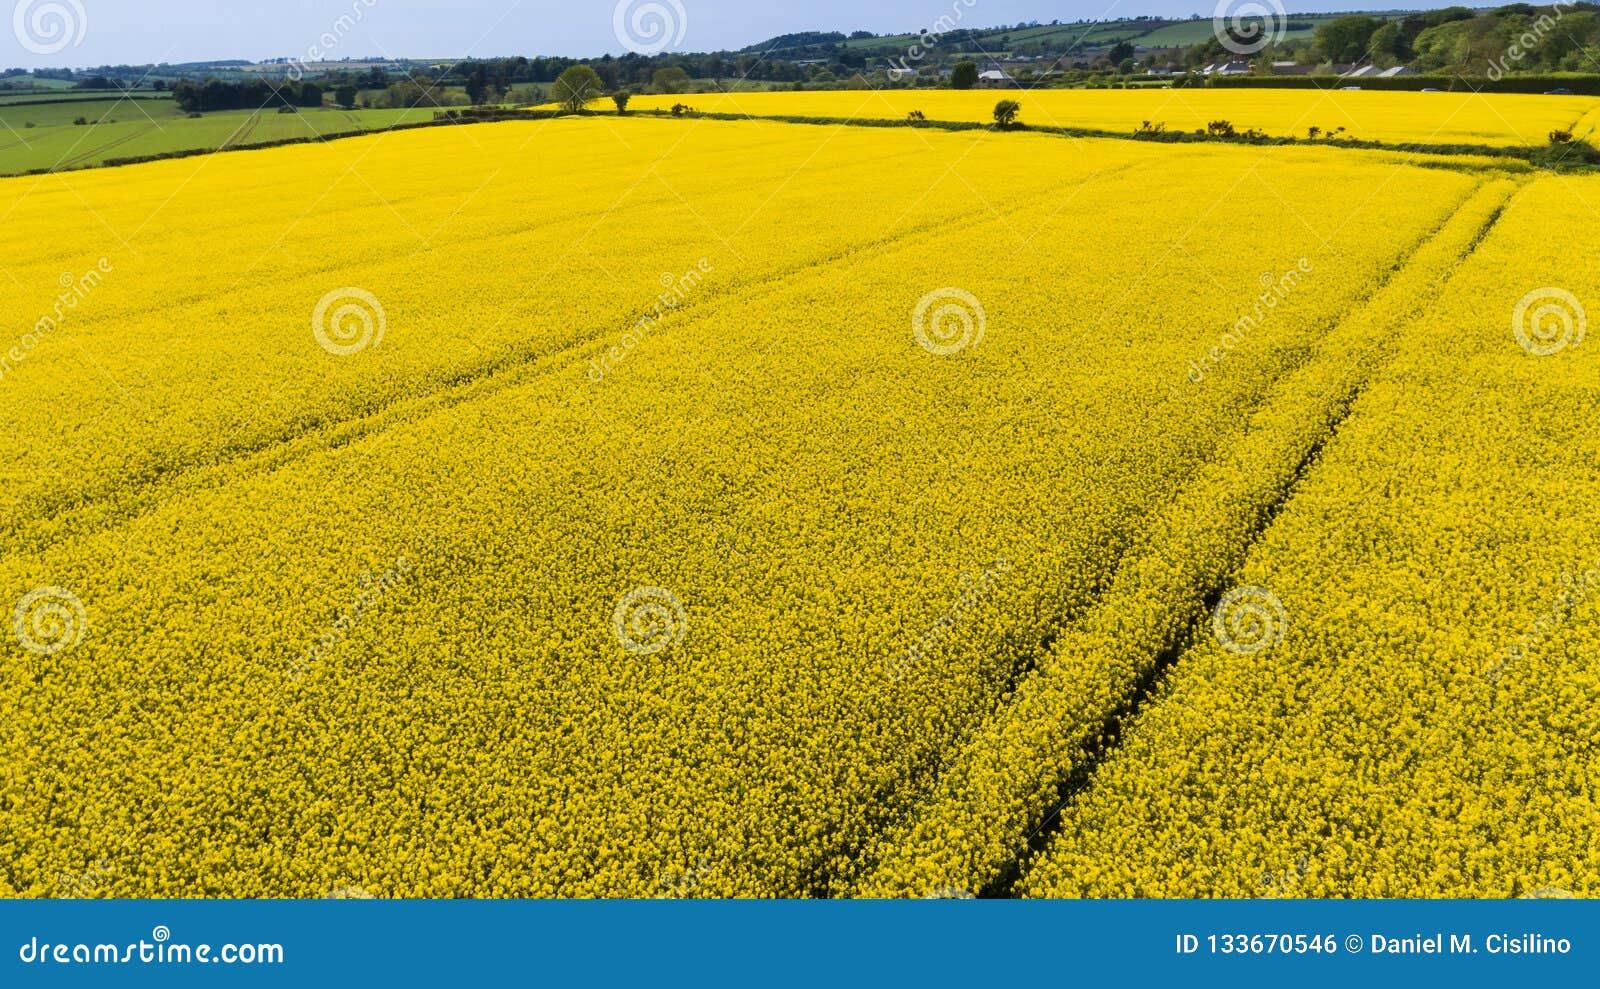 Farming Koolzaad, Canola, Biodieselgewas ierland